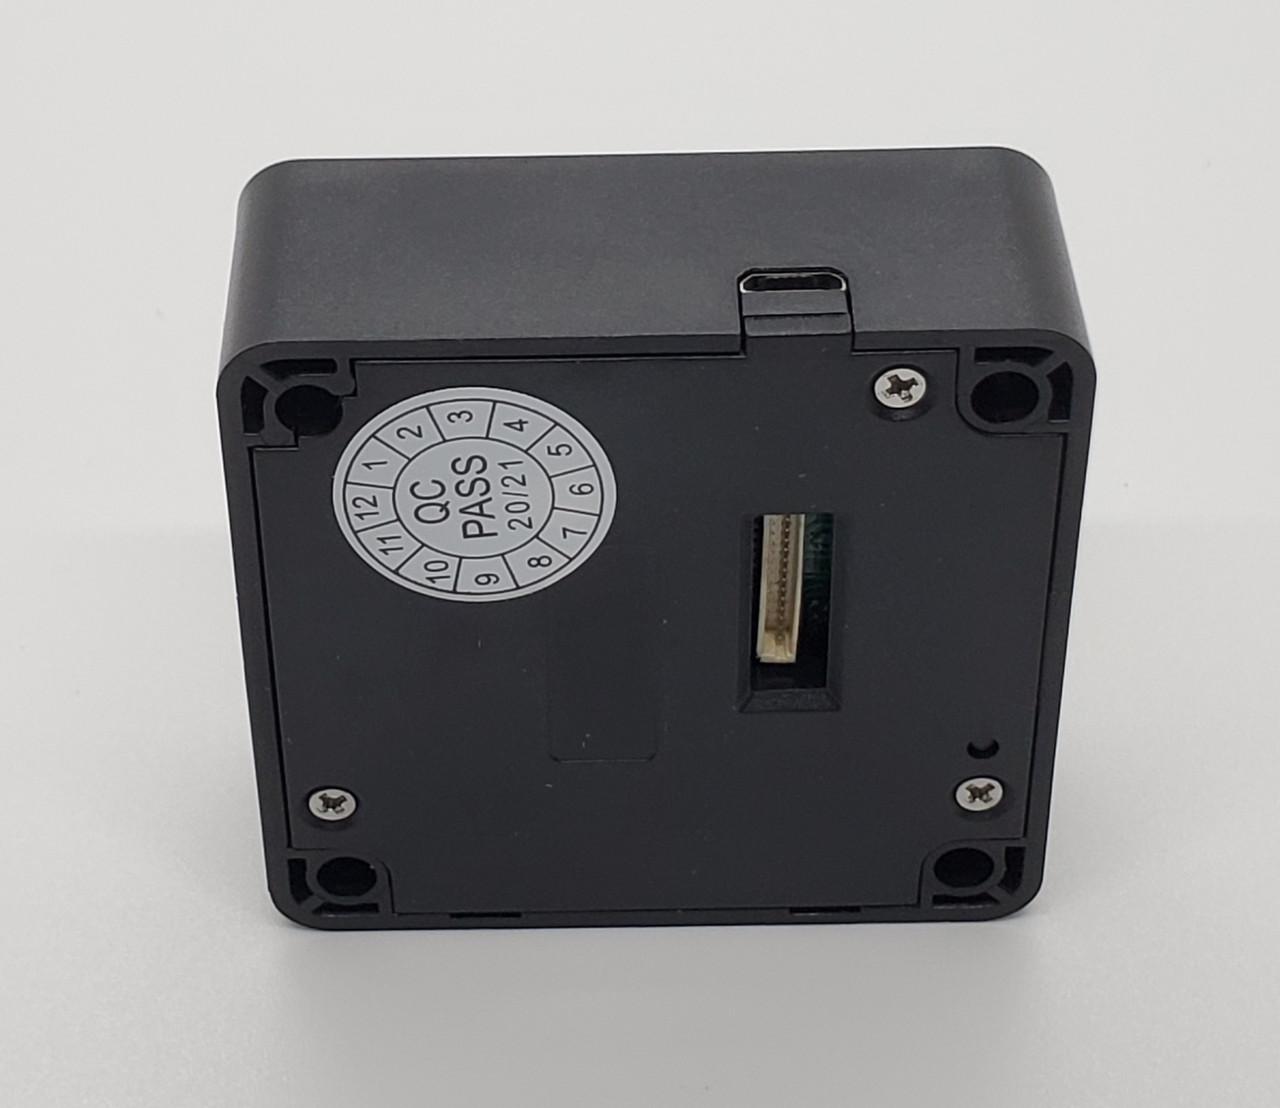 Small RFID Hidden Shelf / Cabinet Drawer Lock, 3 Keys - Gun Safes, cabinets